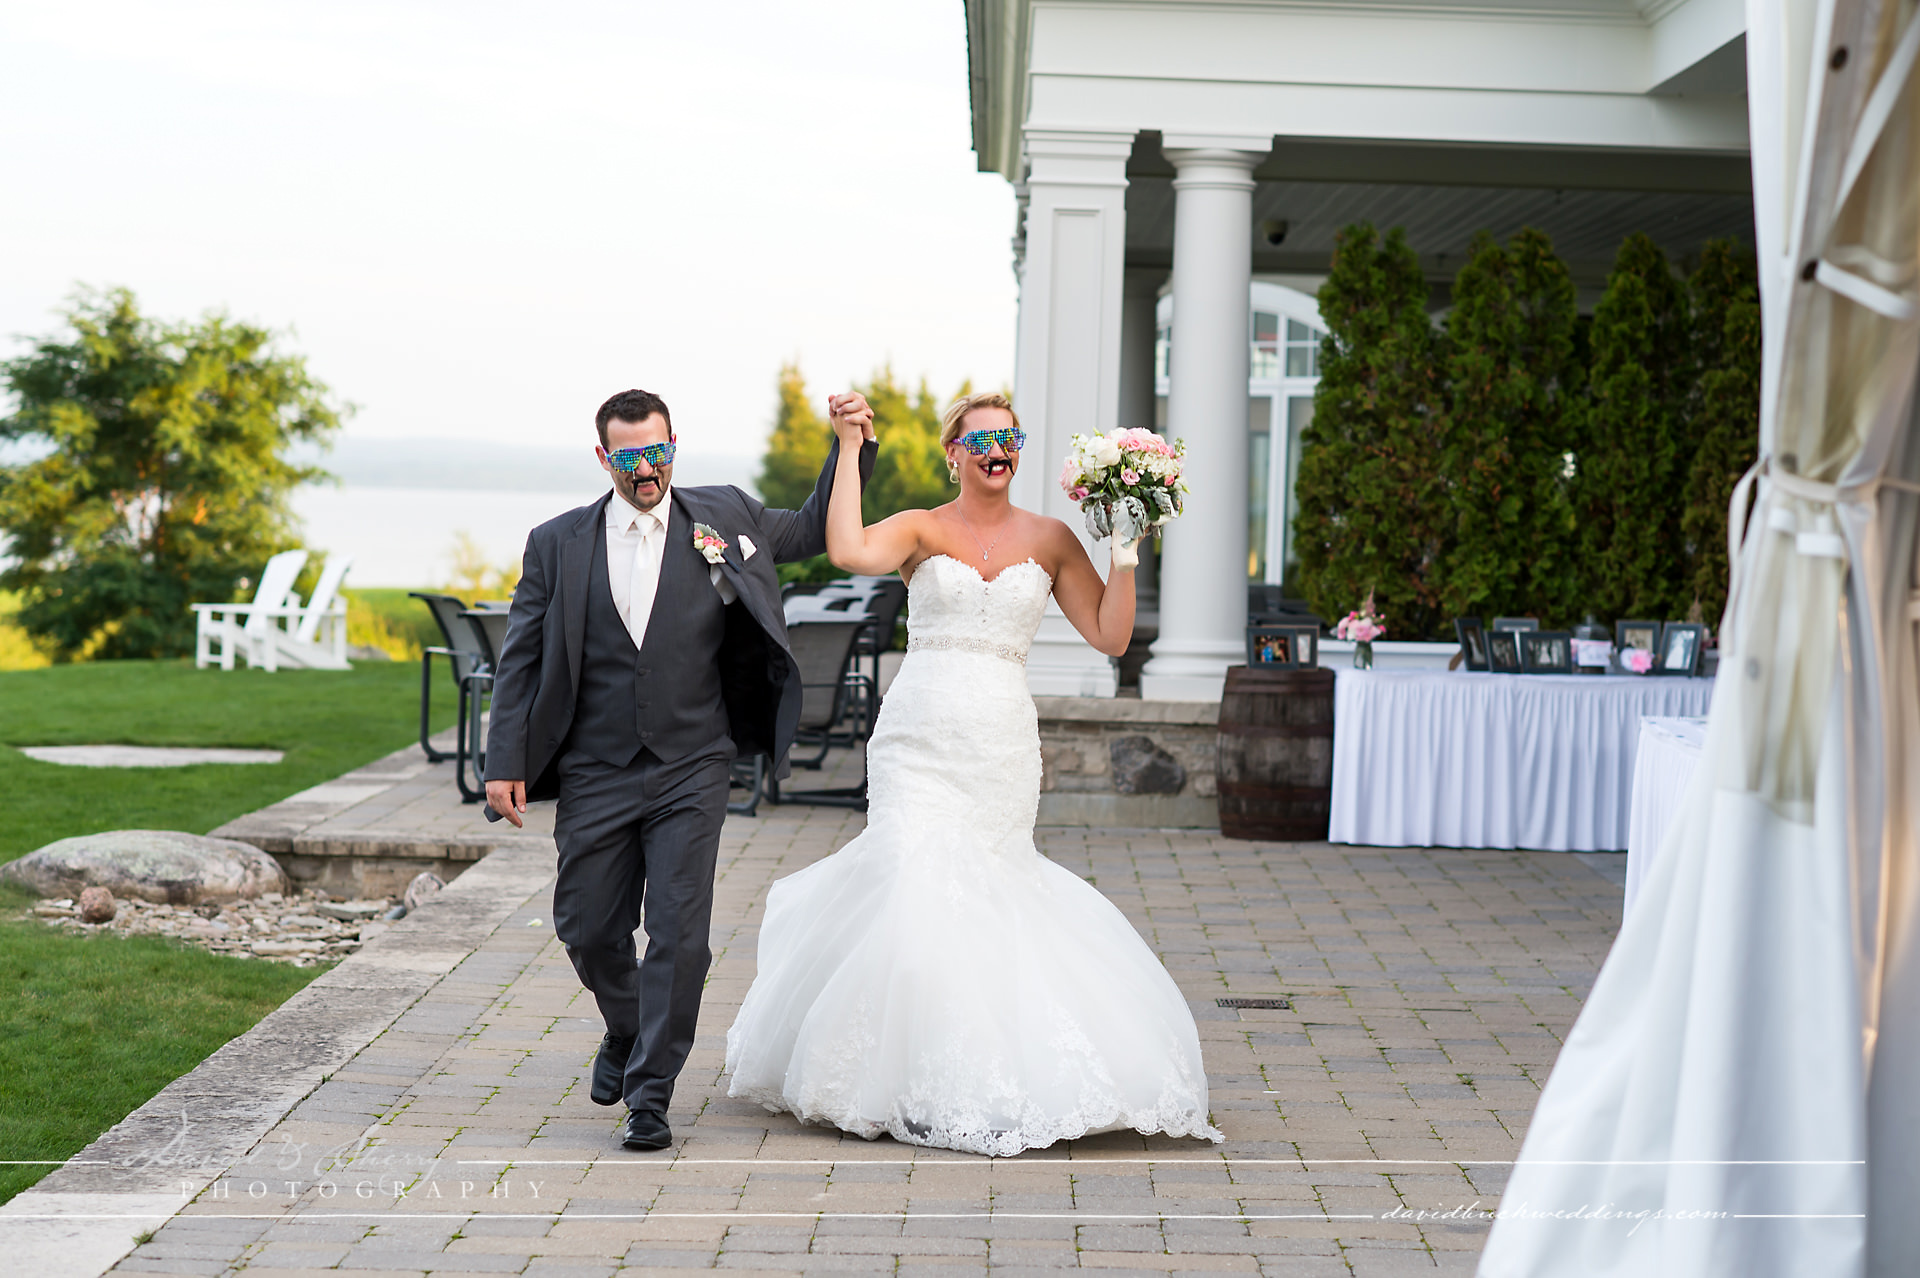 Cobble_Beach_Wedding_Photography_031